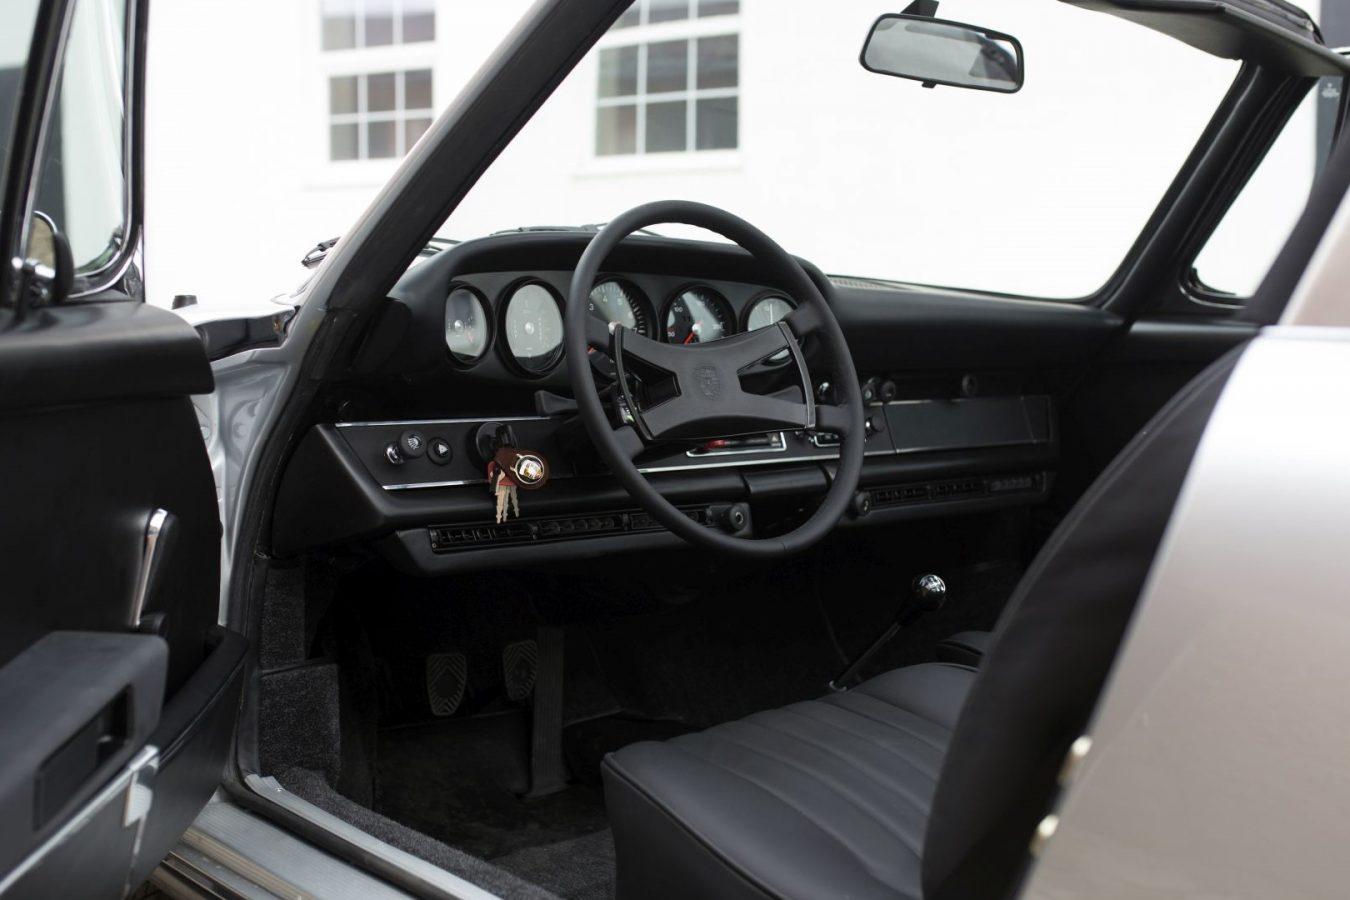 Lenkrad eines Porsche 911S Targa